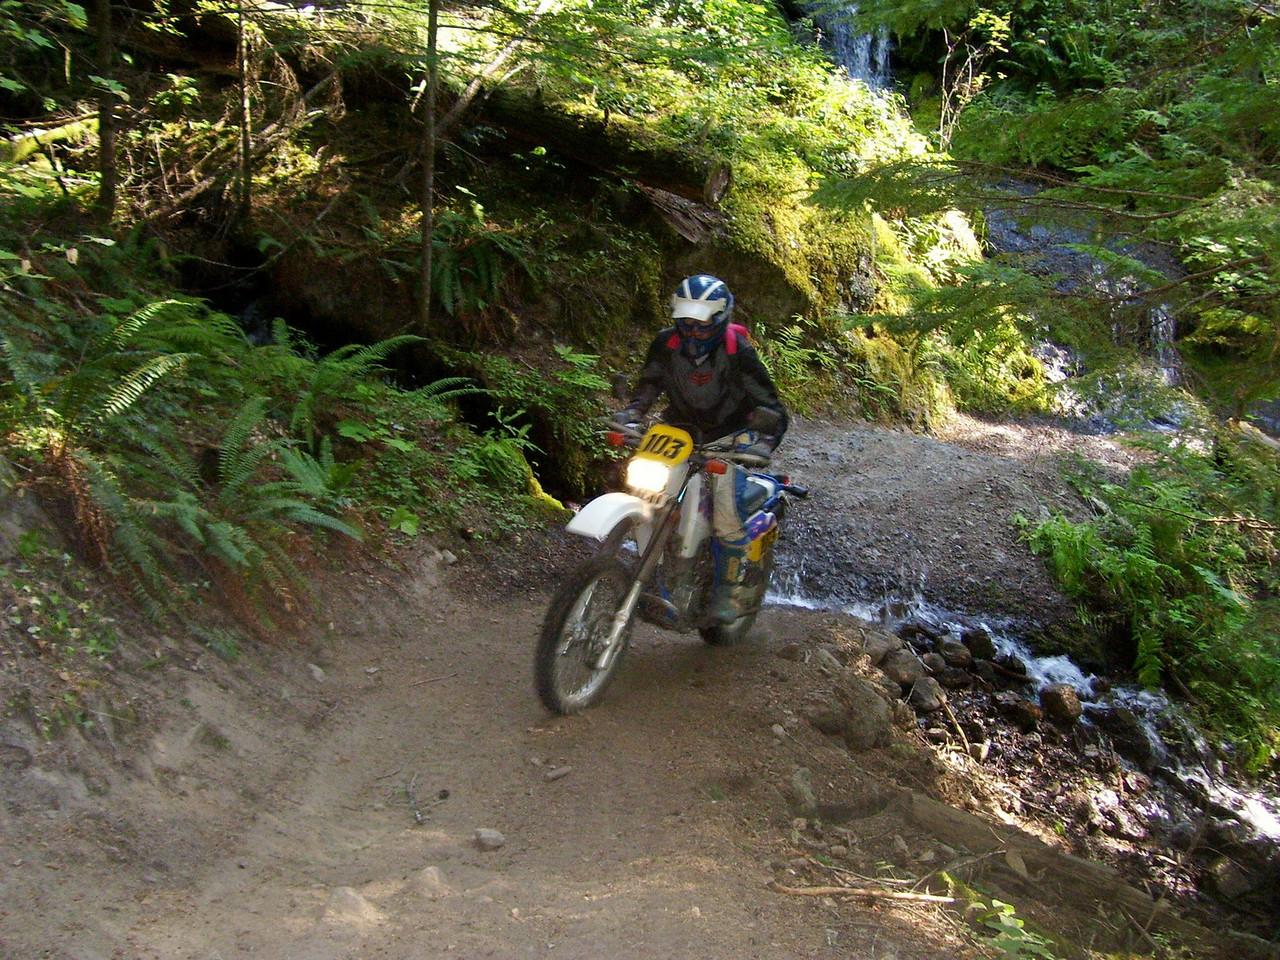 Charlie Bethards on the 270 trail Thursday morning